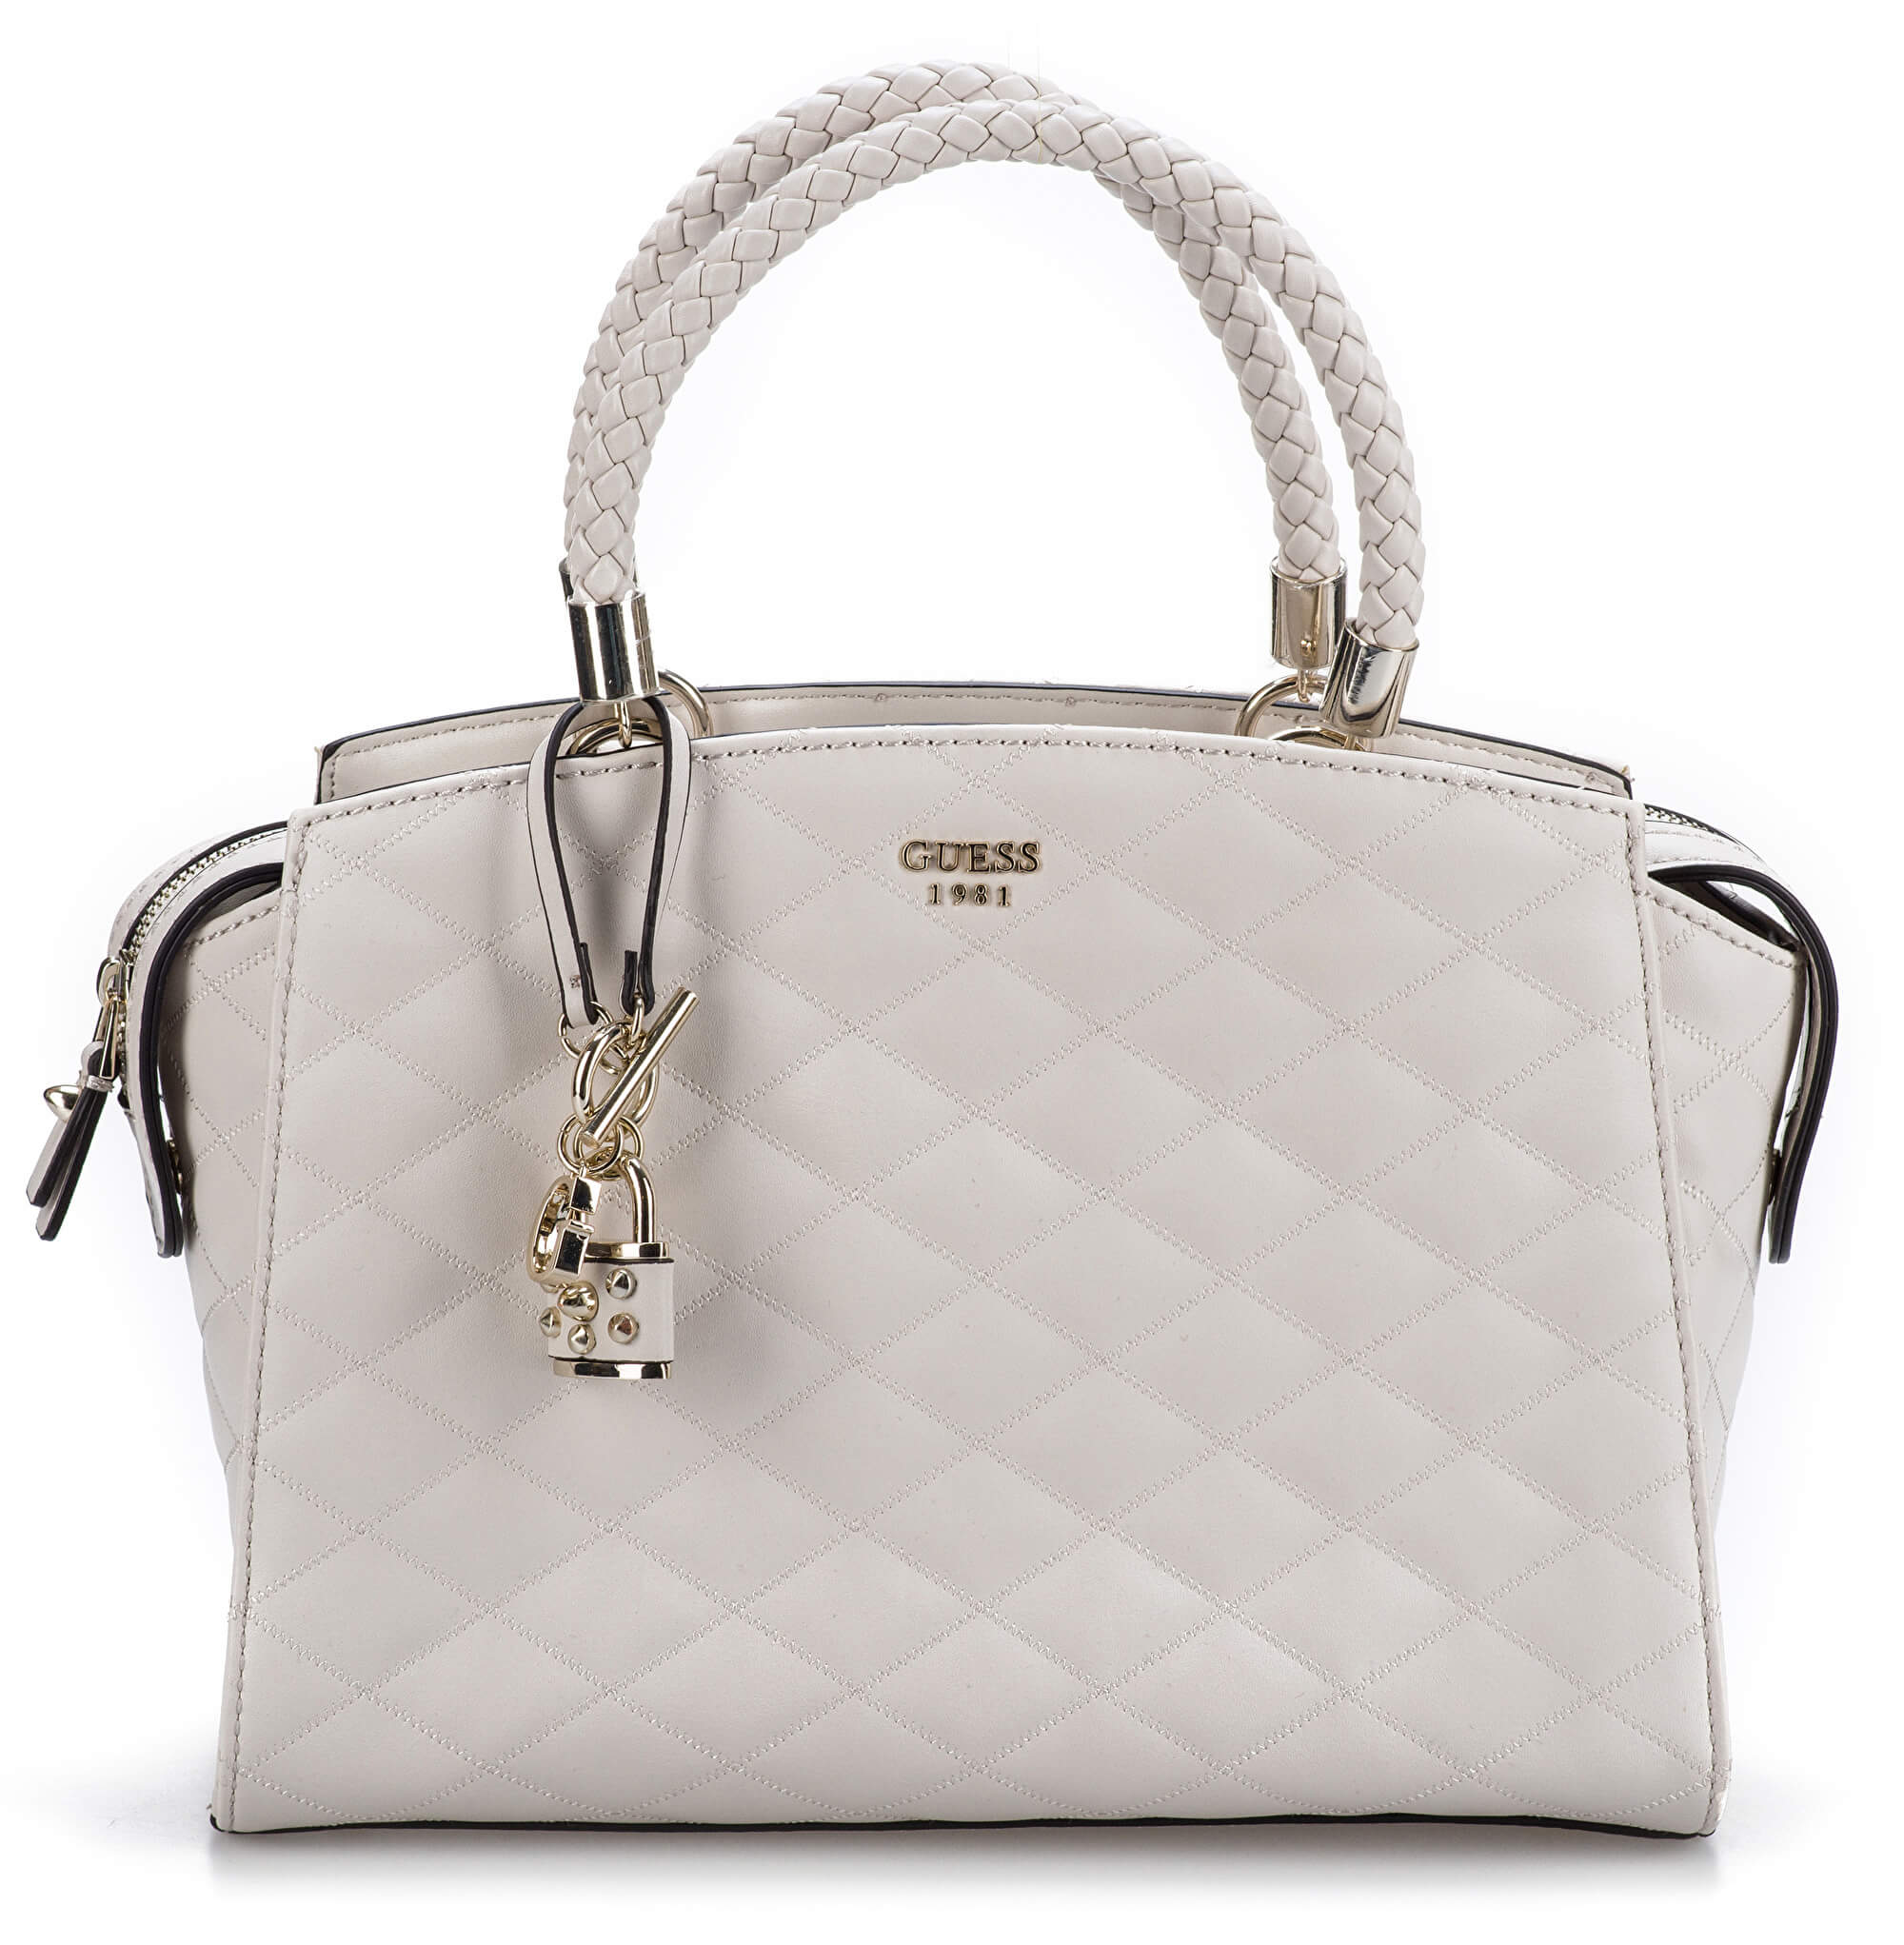 Guess Dámska kabelka Guess Penelope Quilted Satchel Light Grey ... 5d3b470f593